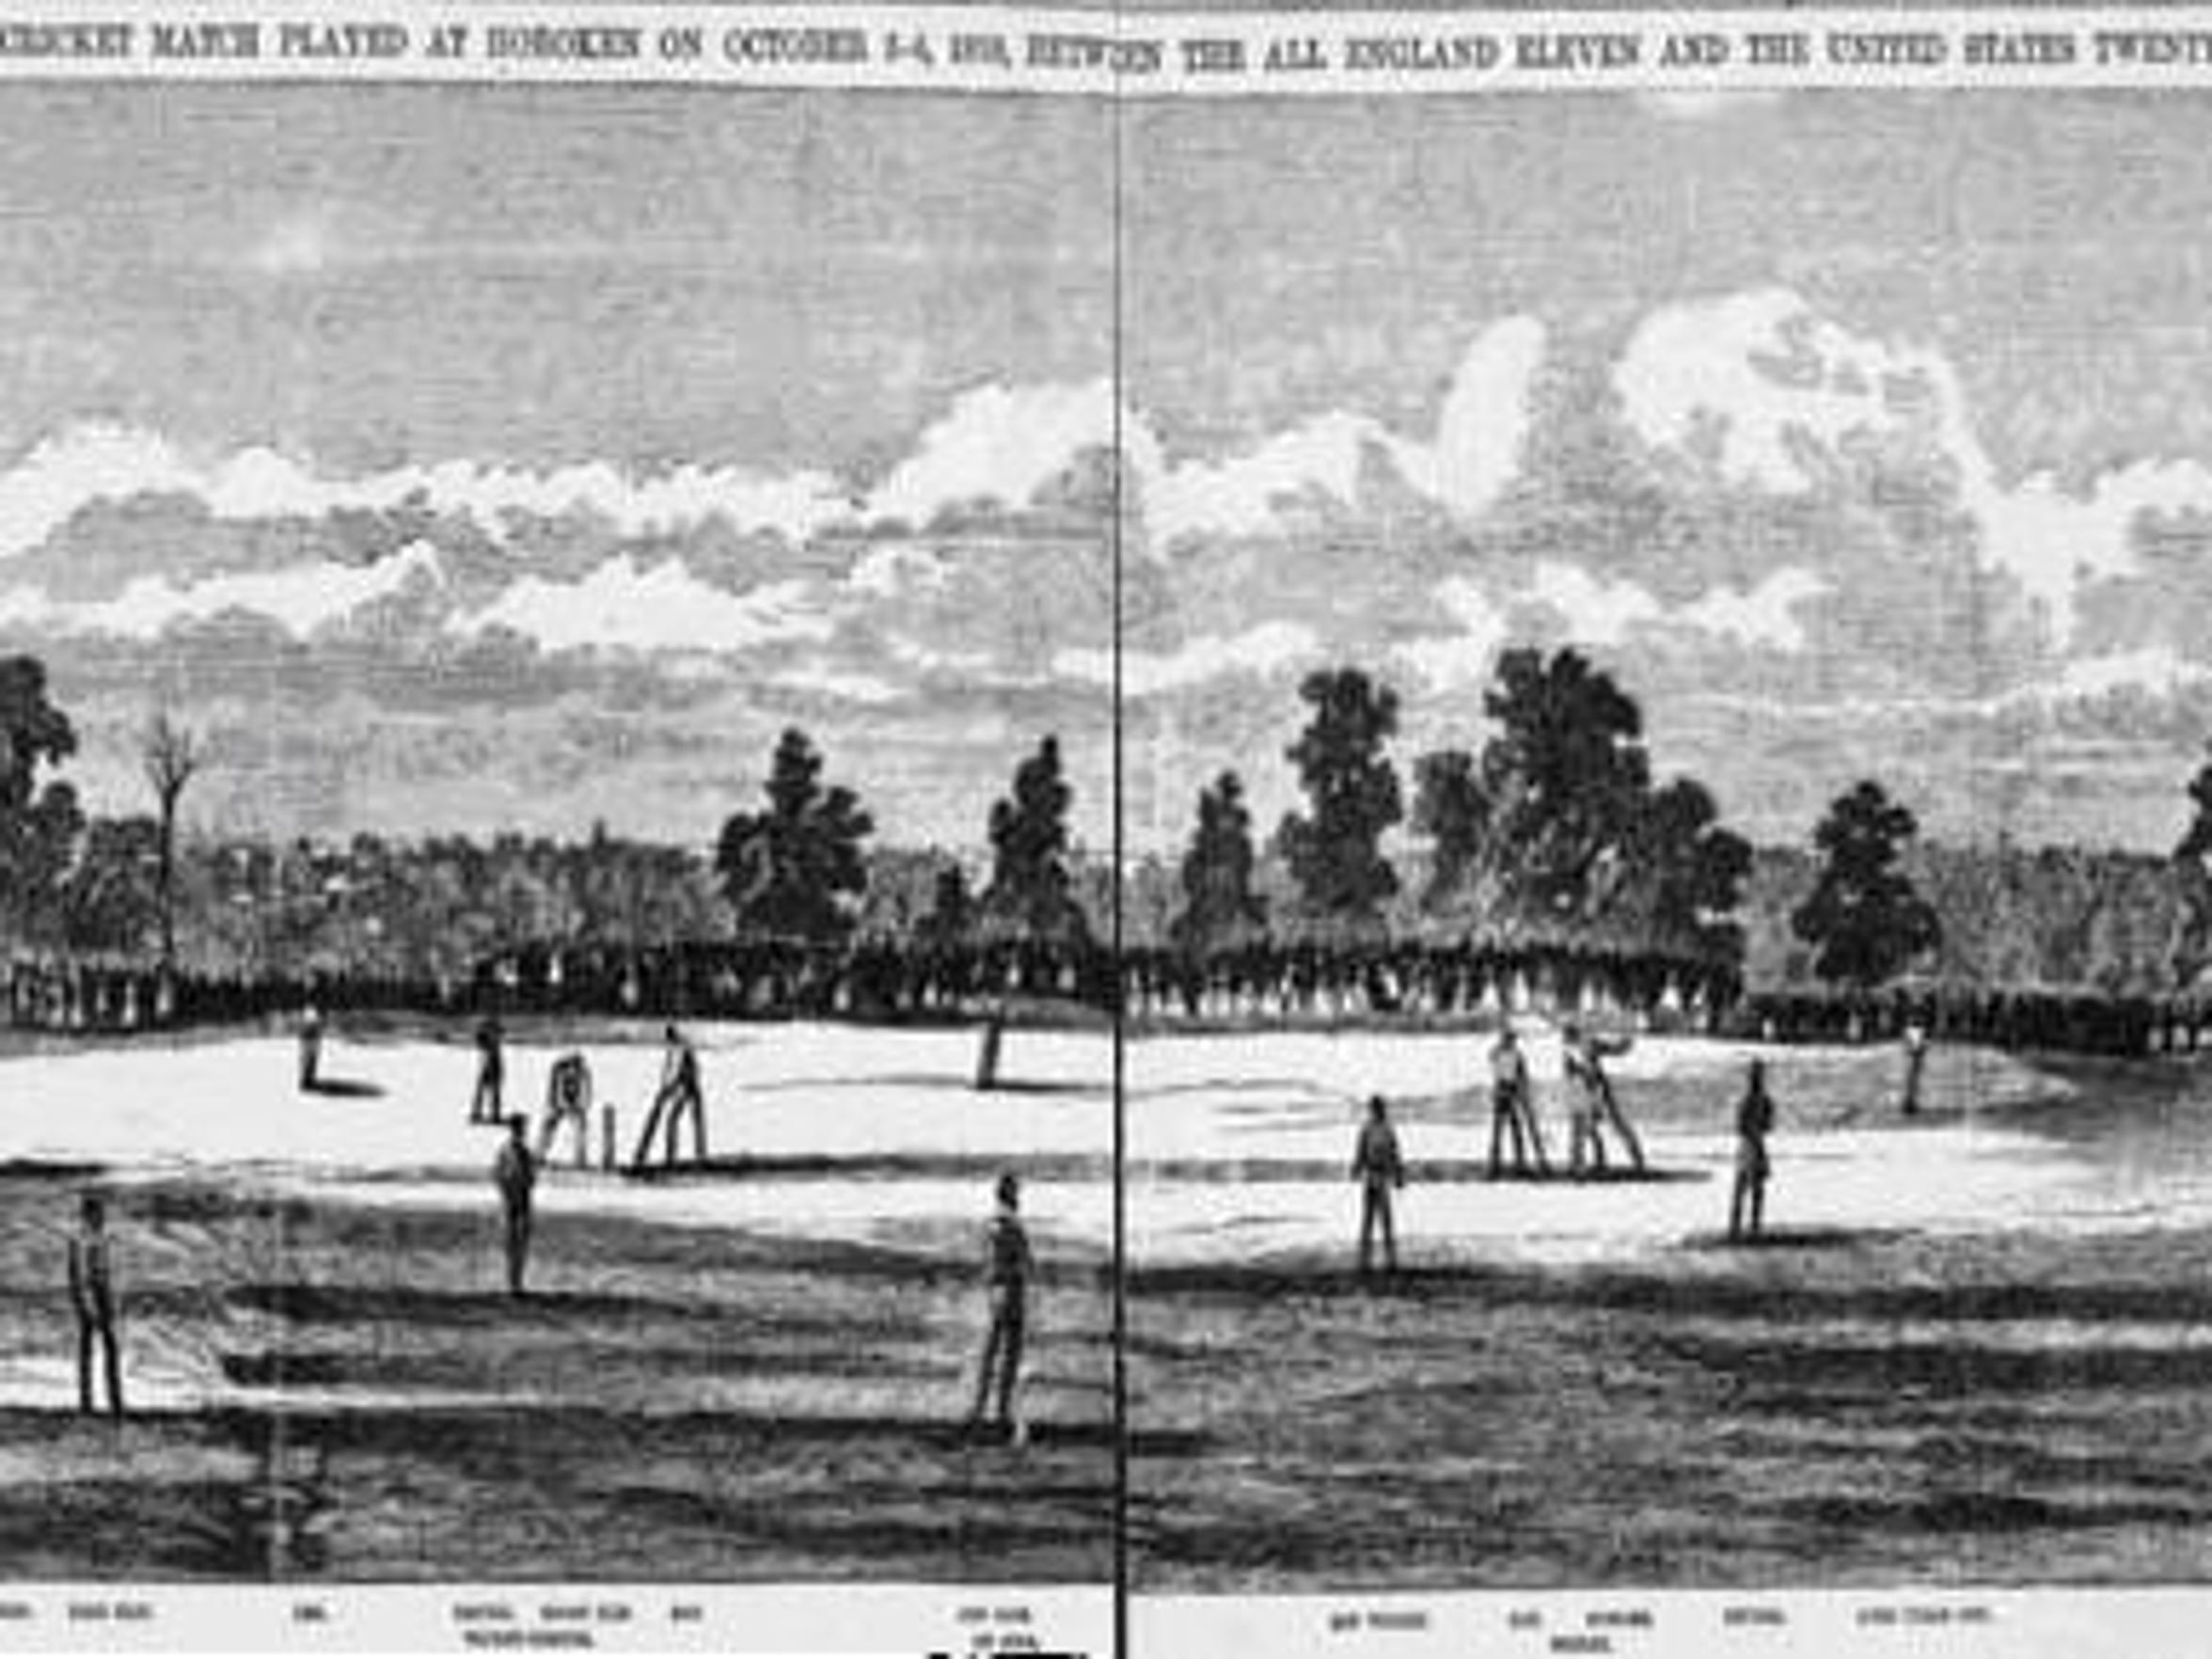 Elysian Fields in Hoboken was the site of many a cricket